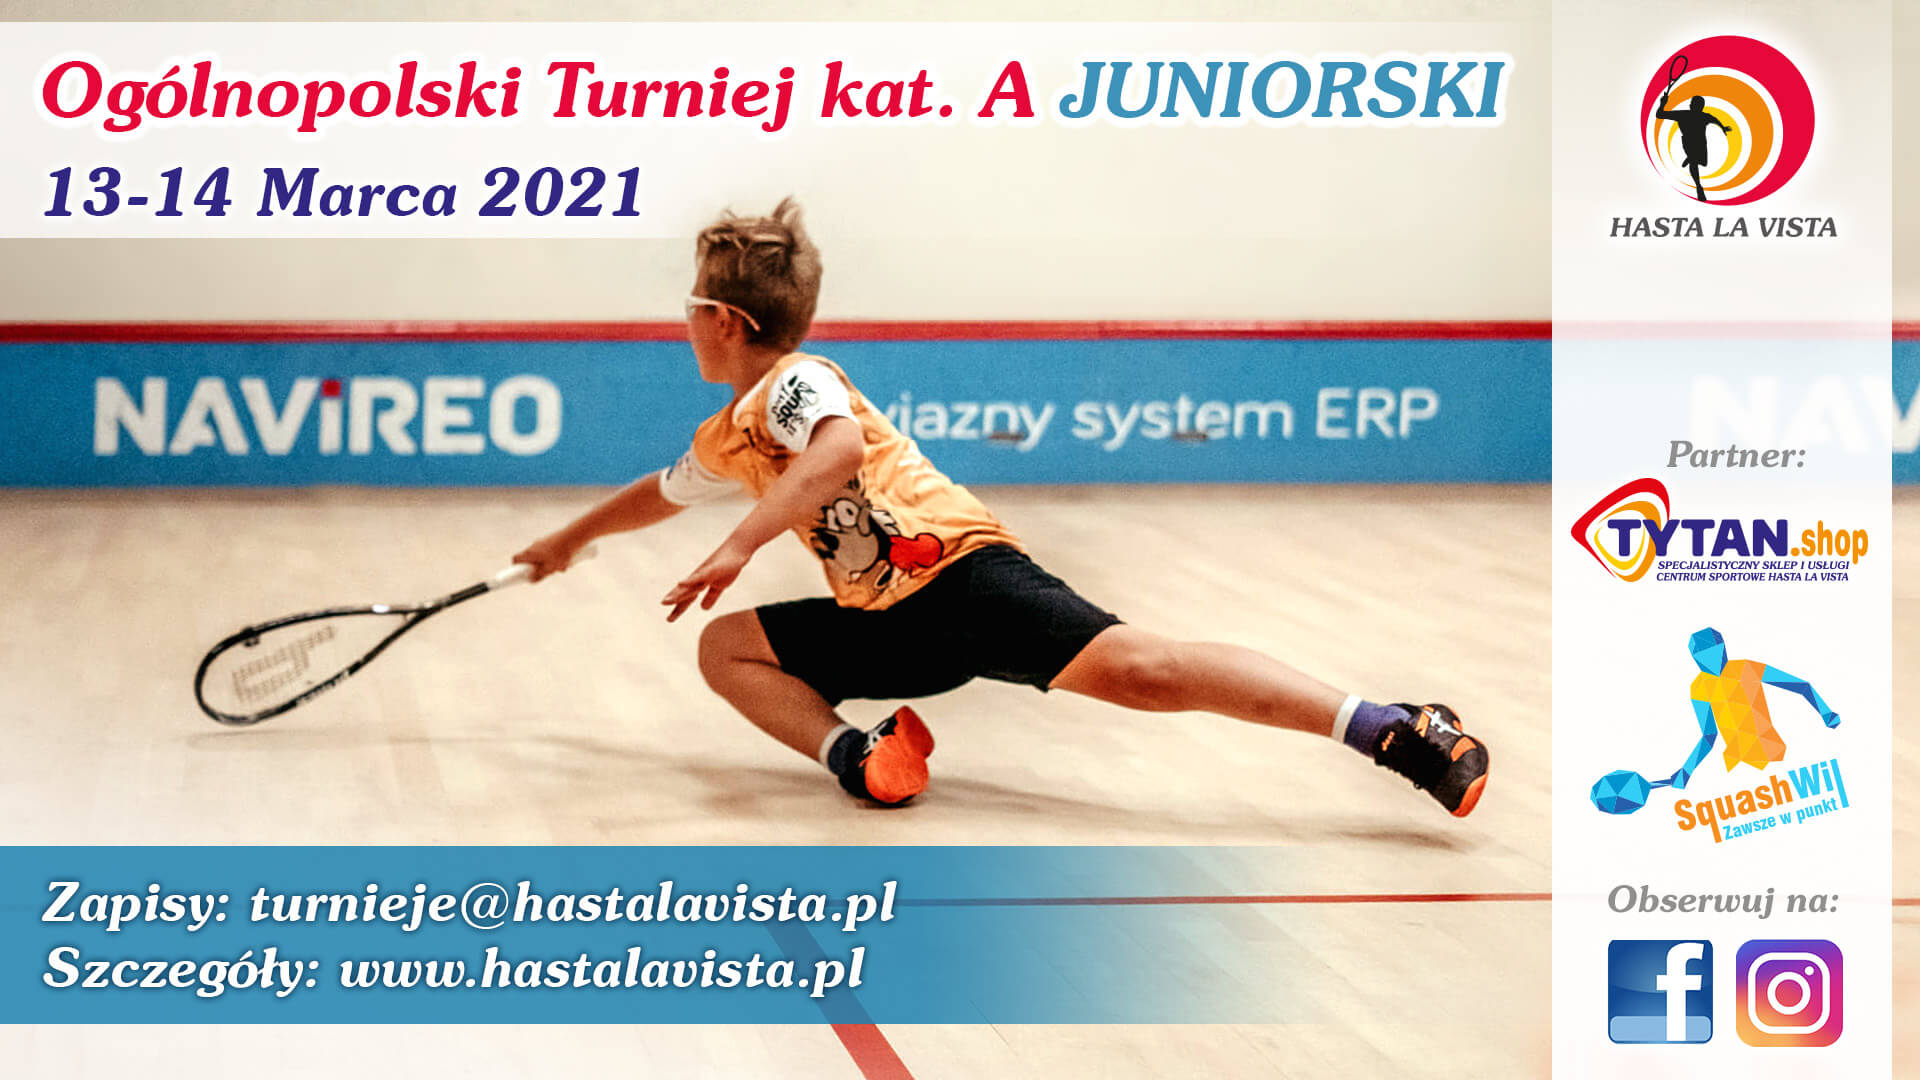 EKRAN_HLV_Turniej-A_Juniorski_II2021_(1920×1080)_2